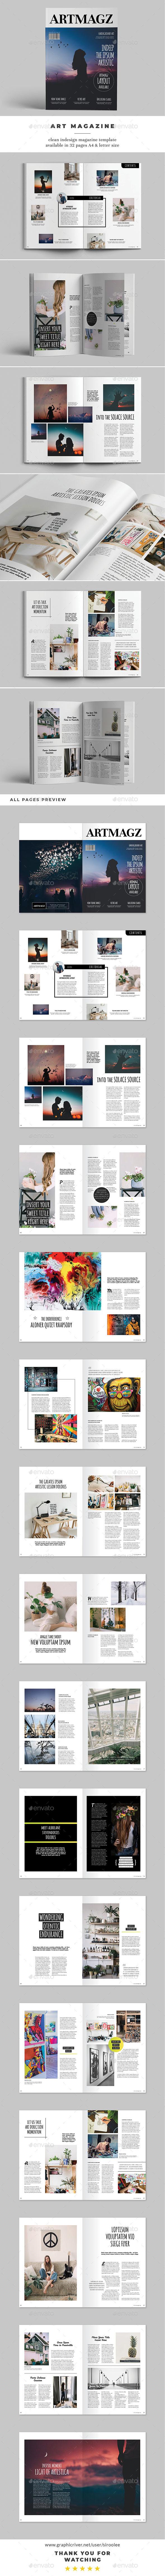 Art Magazine Vol.02 - Magazines Print Templates